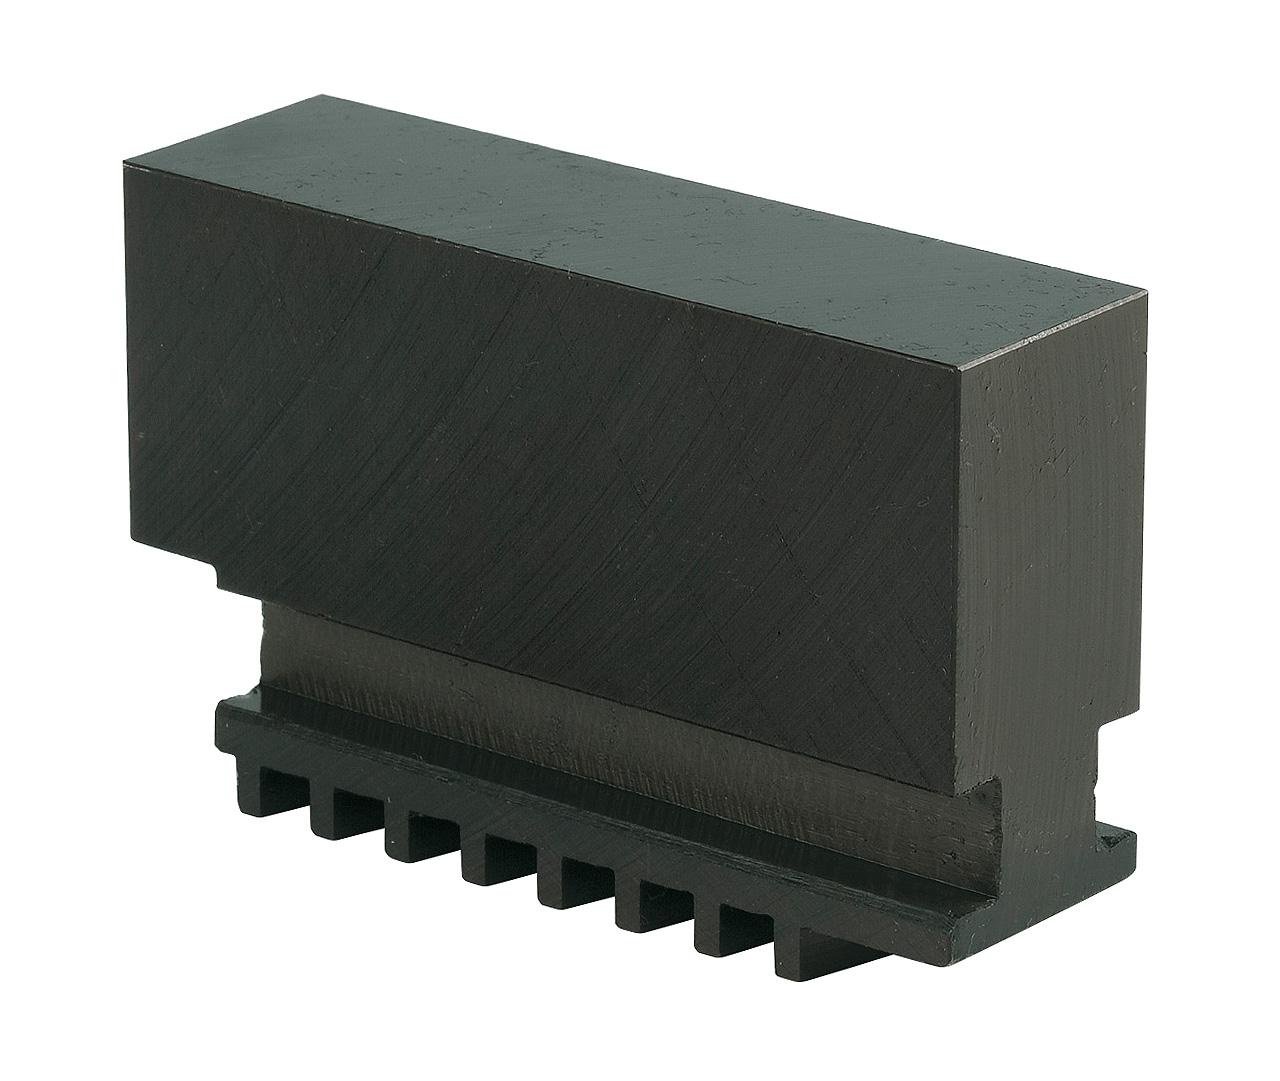 Szczęki jednolite miękkie - komplet DSJ-DK11-500 BERNARDO